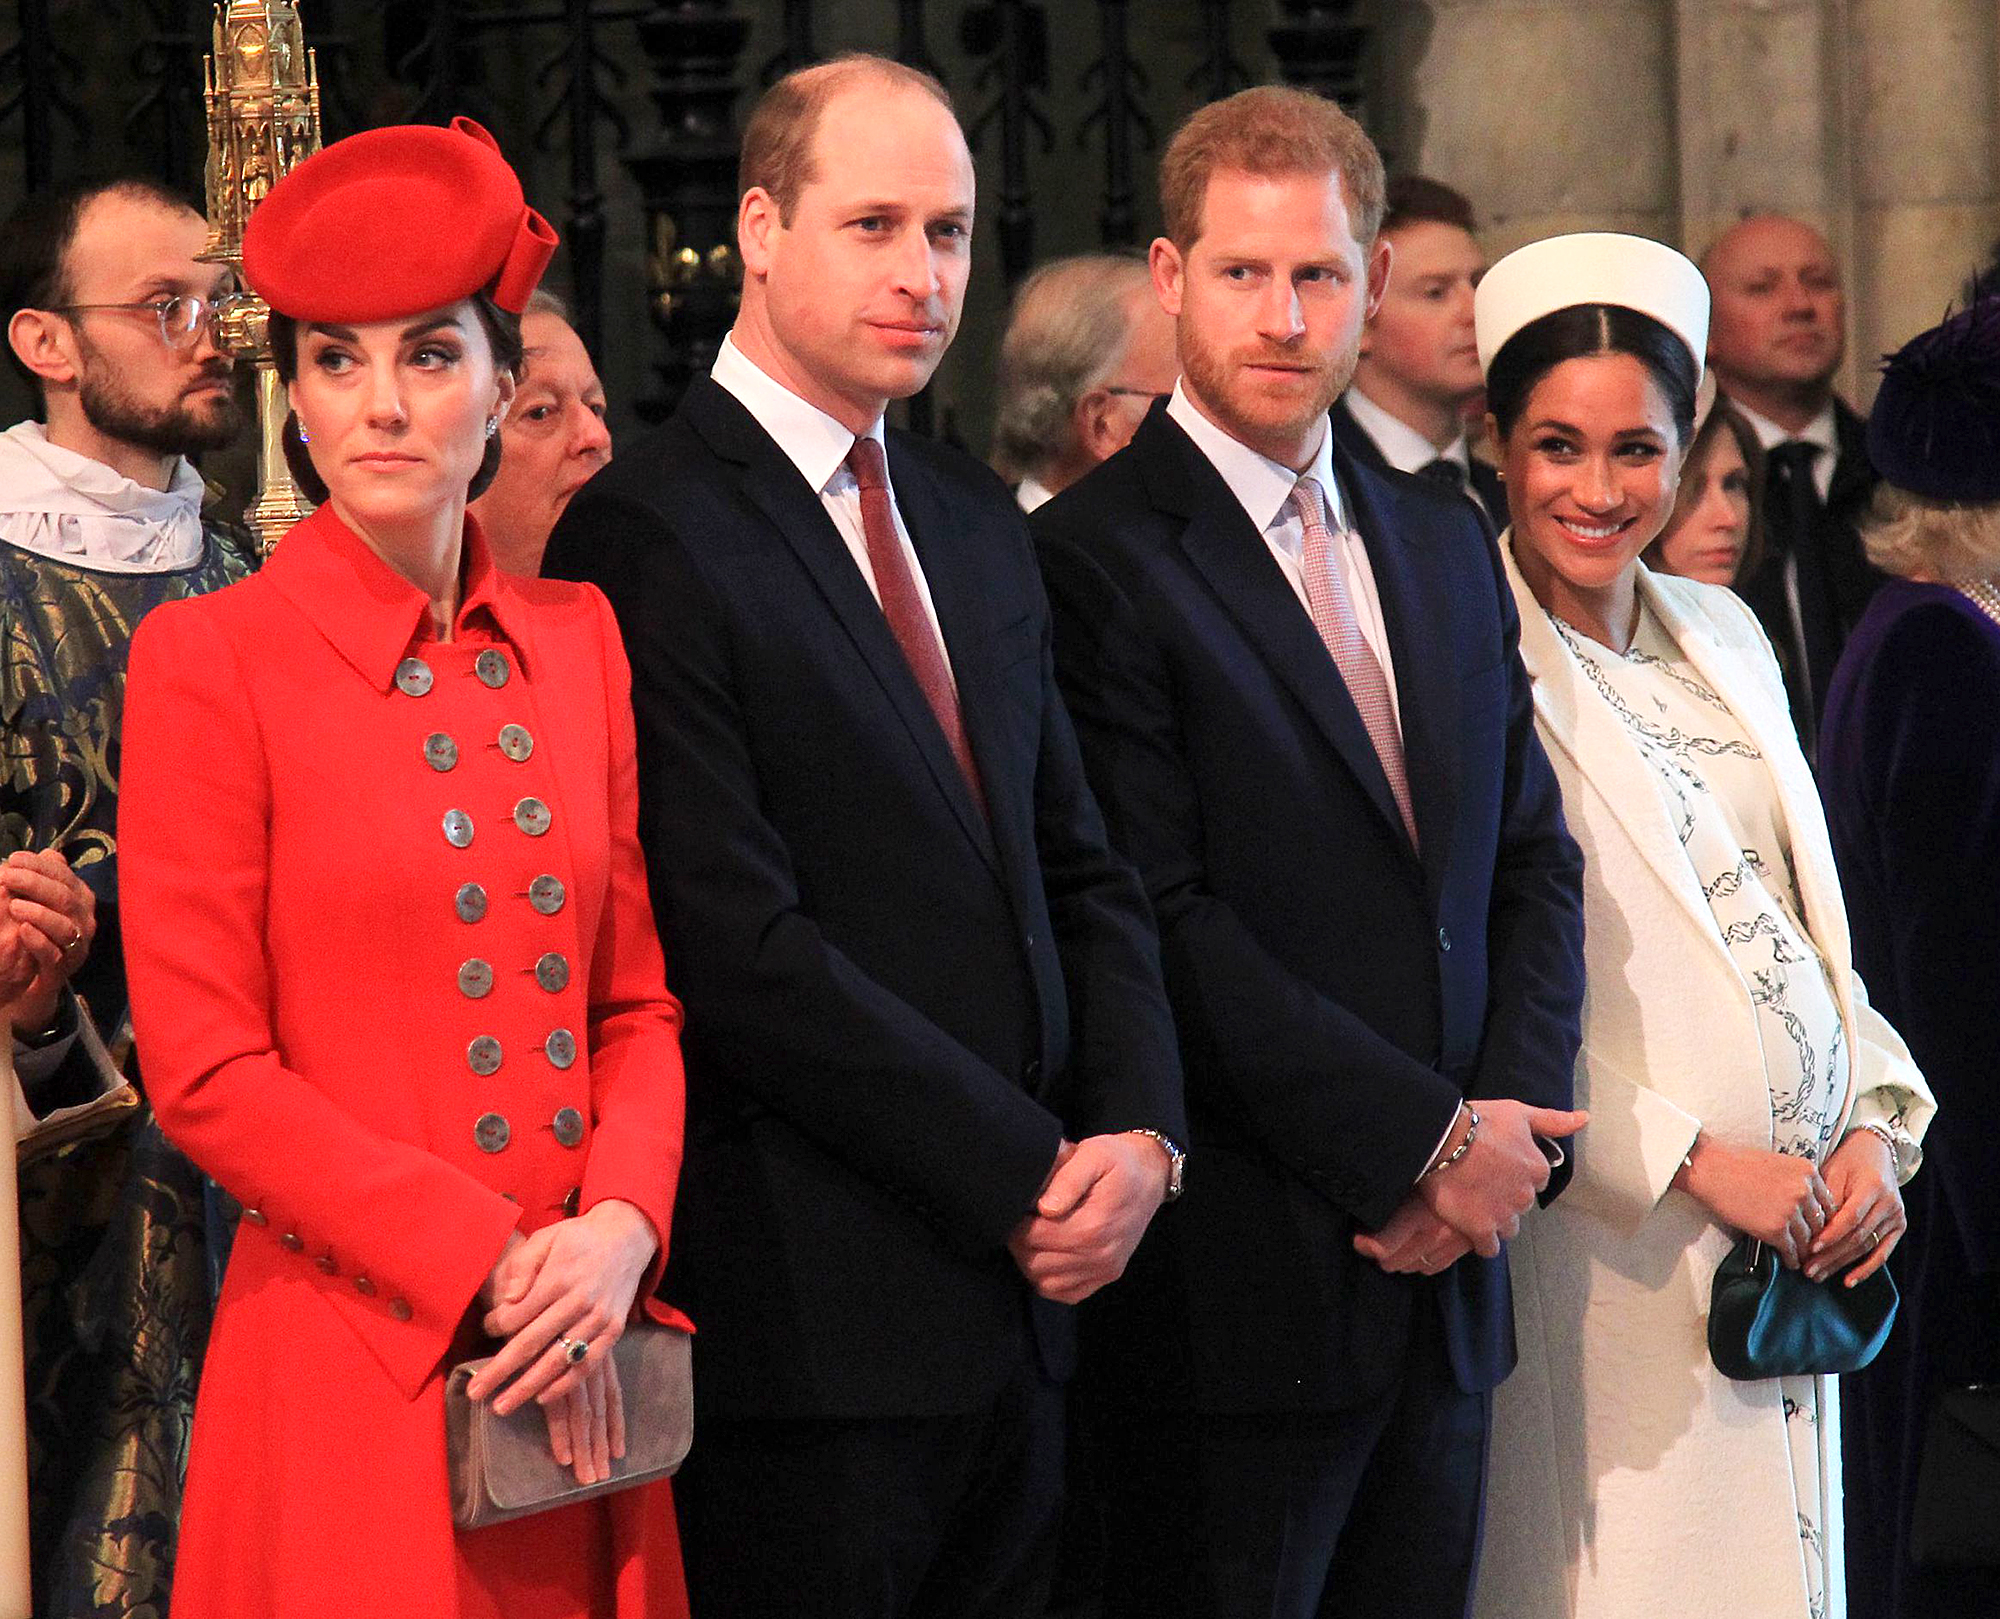 Duchess-kate-Prince-William-Meghan-Markle-Prince-Harry